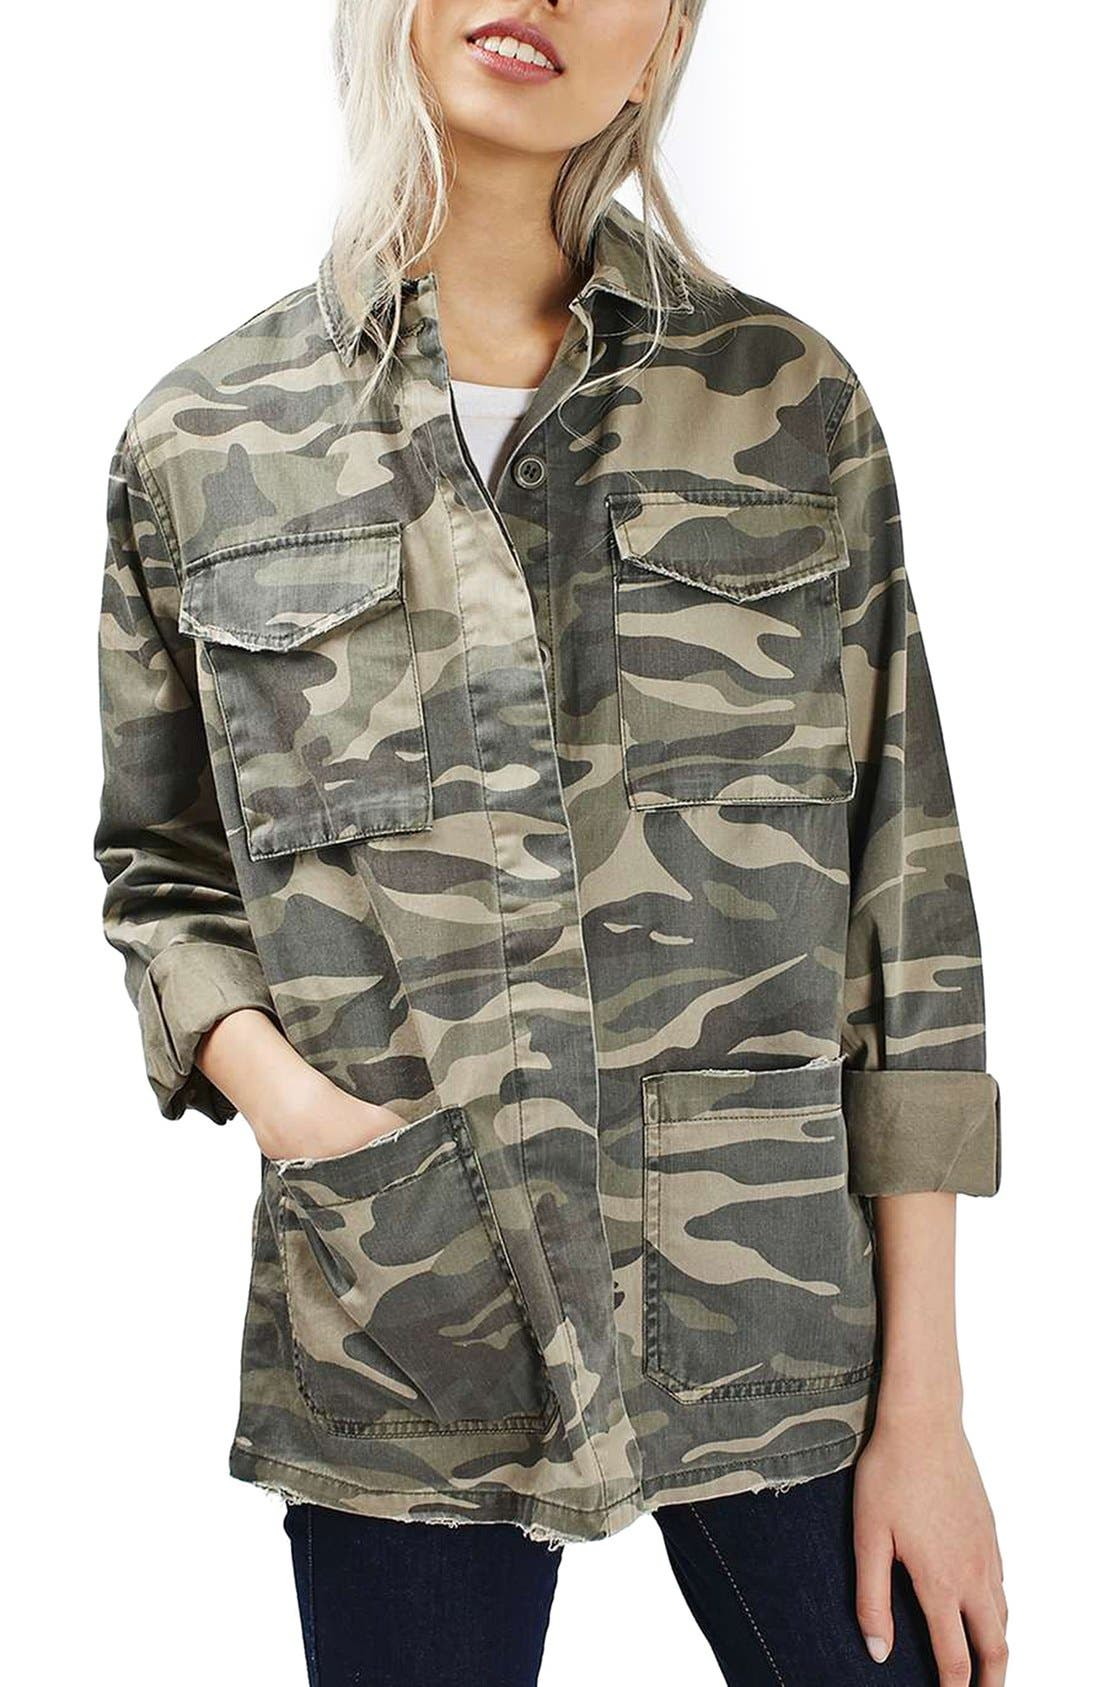 Alternate Image 1 Selected - Topshop 'Sarge' Camo Shirt Jacket